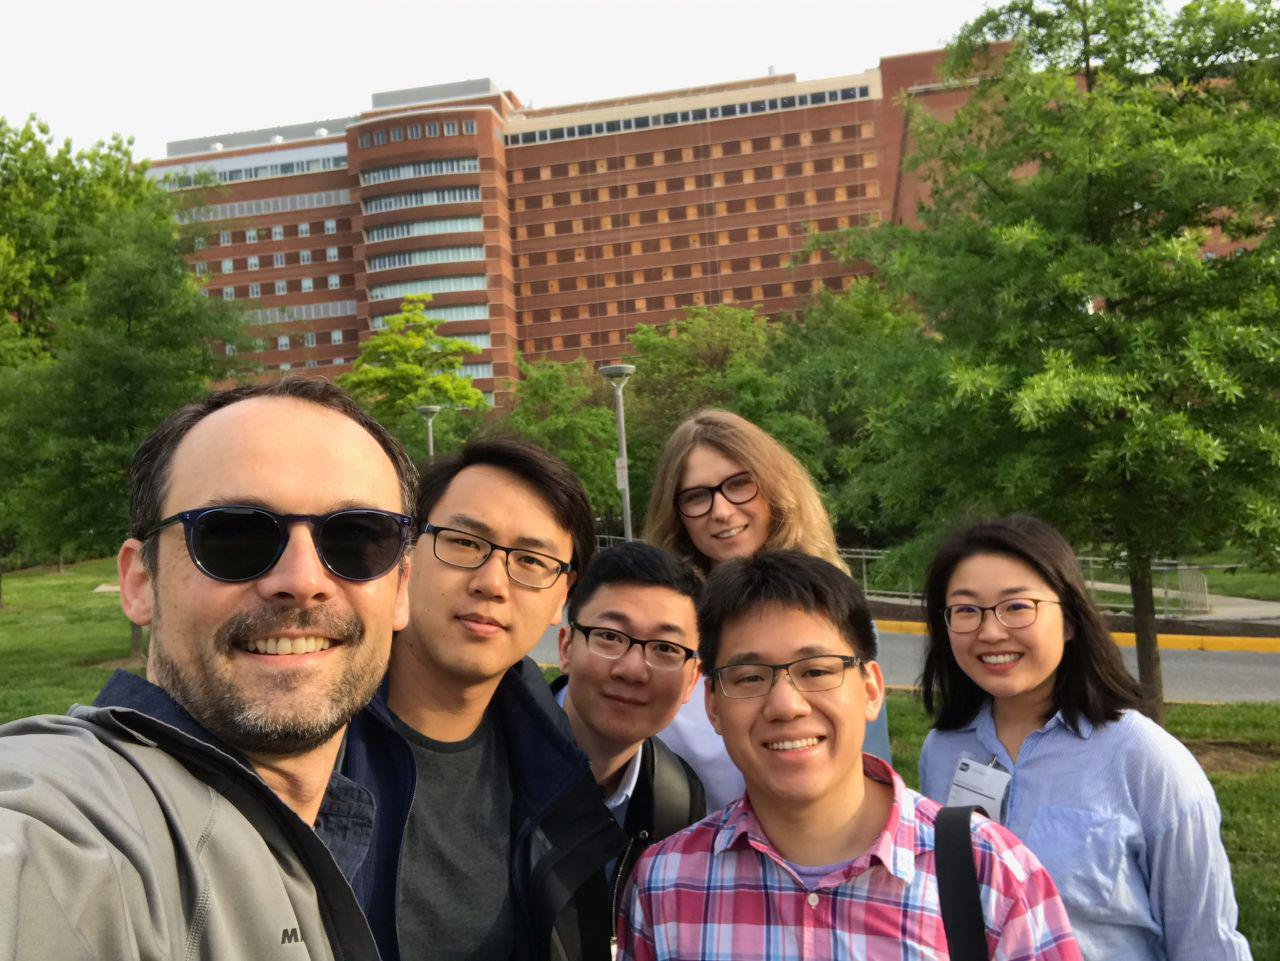 photo_2019-05-06_14-27-35.jpg